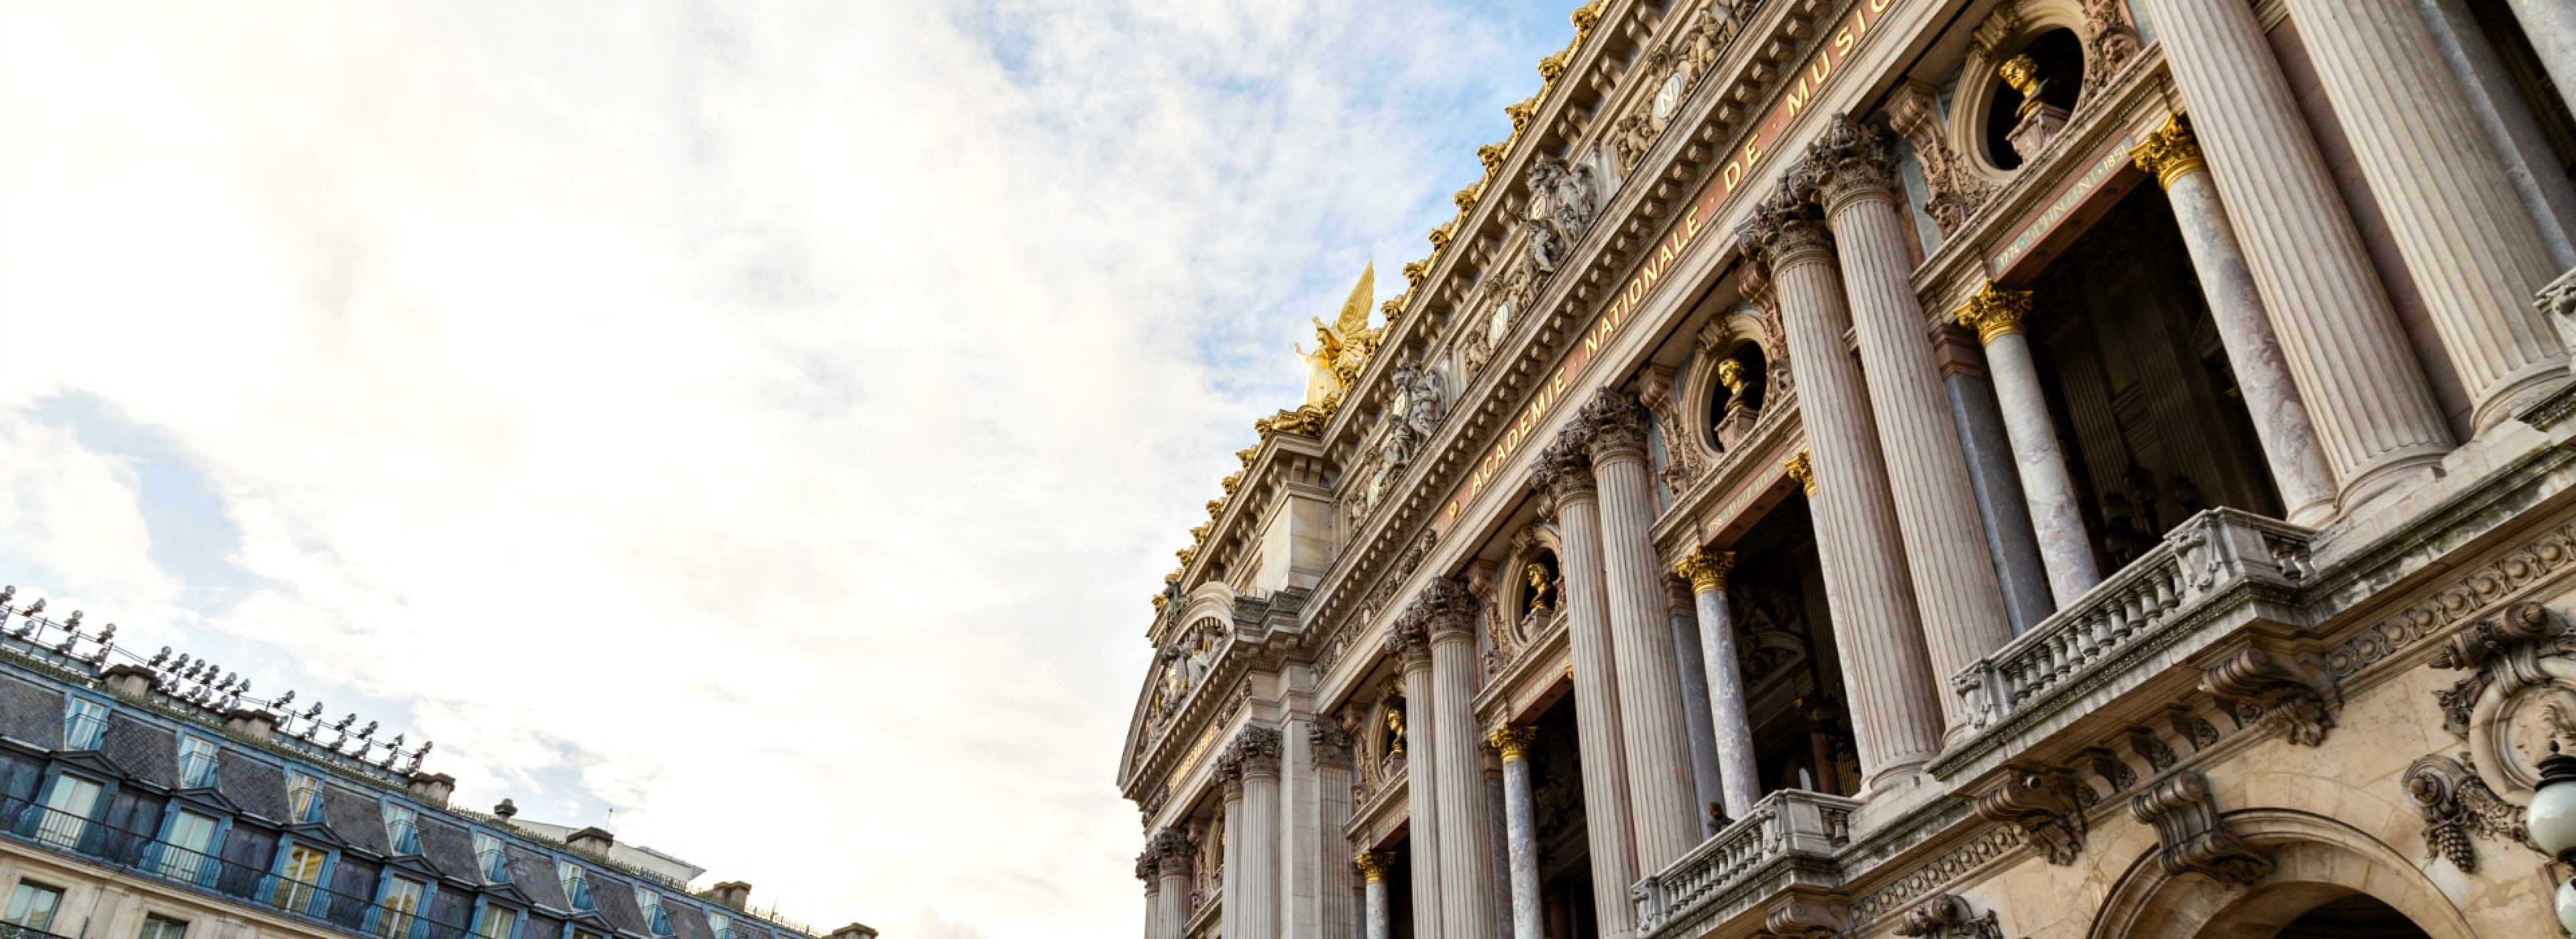 Paris Opera Garnier, France